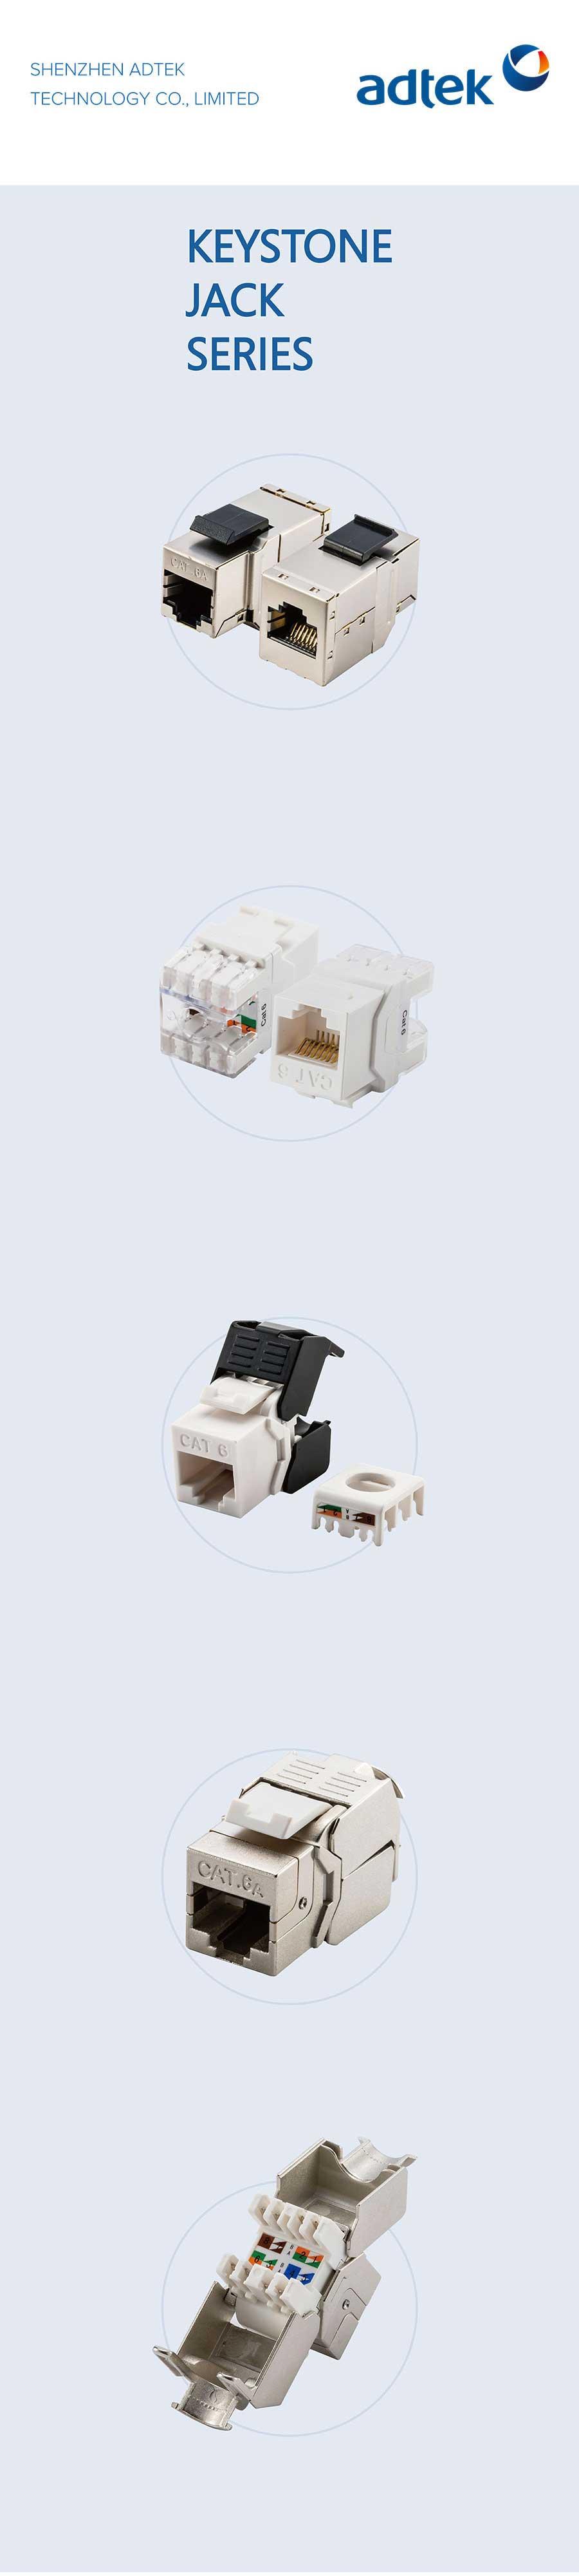 Wiring Management Optimization